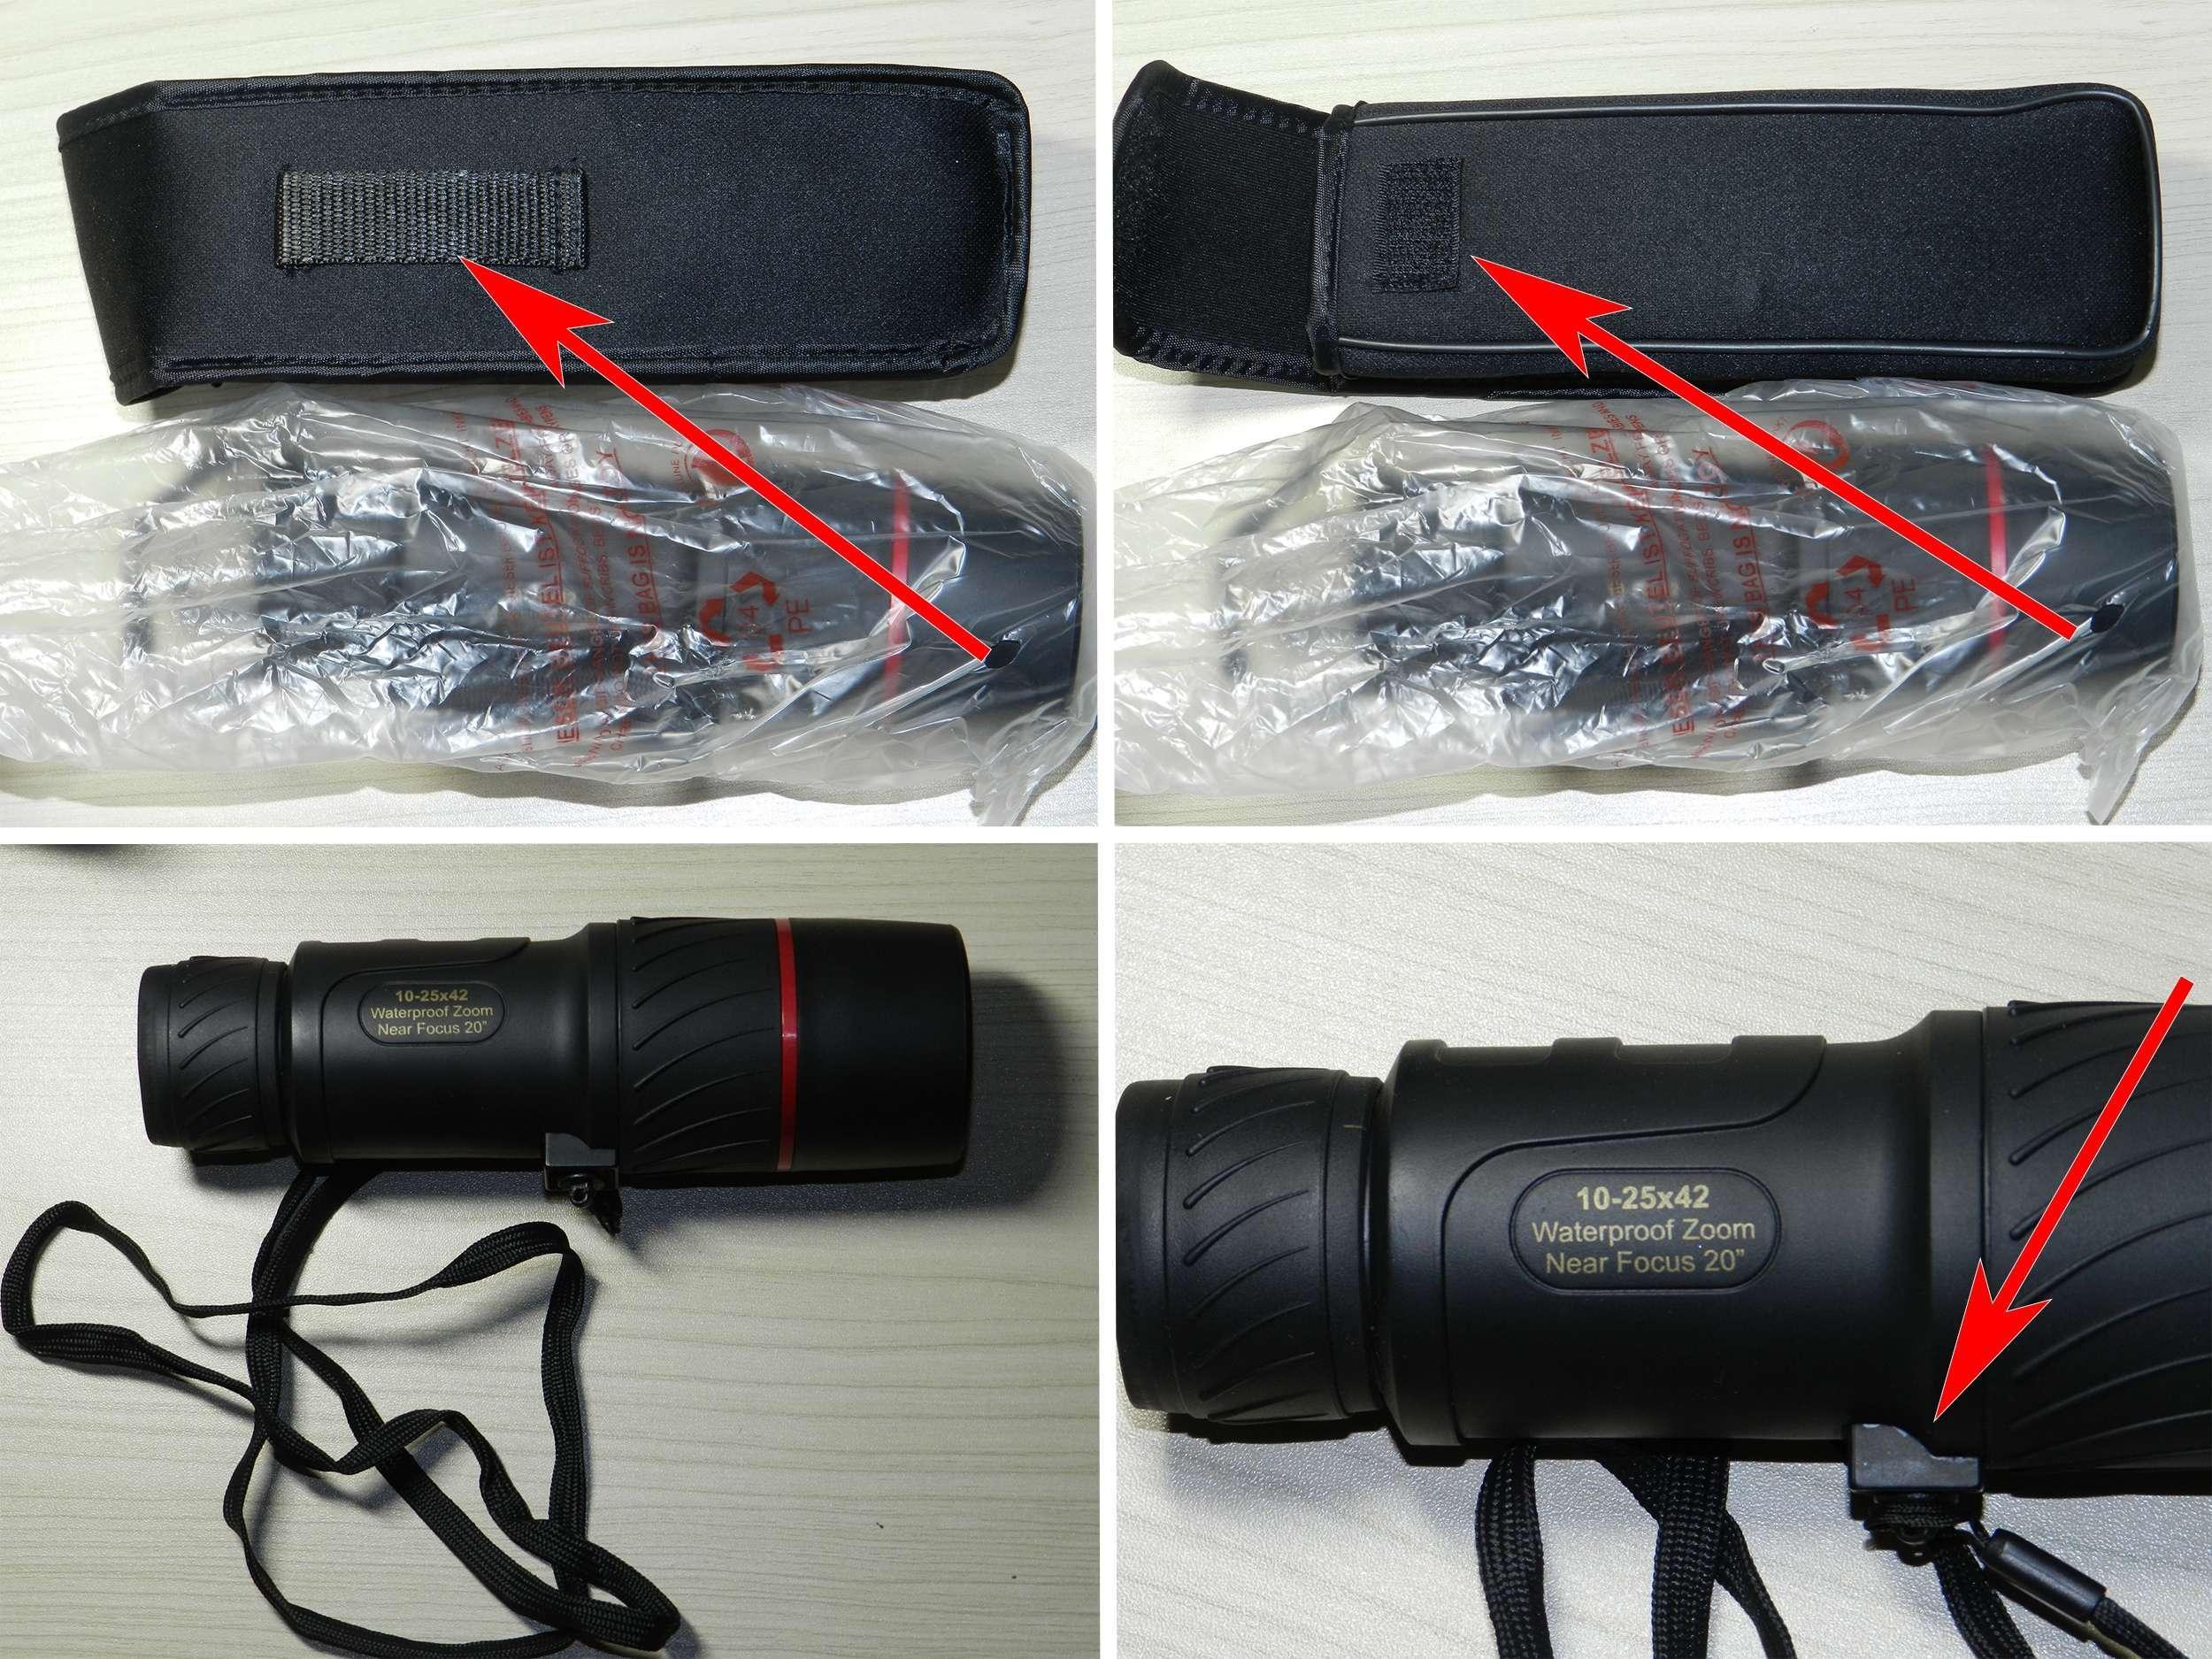 TomTop: Обзор и тест монокуляра VisionKing 10-25x42